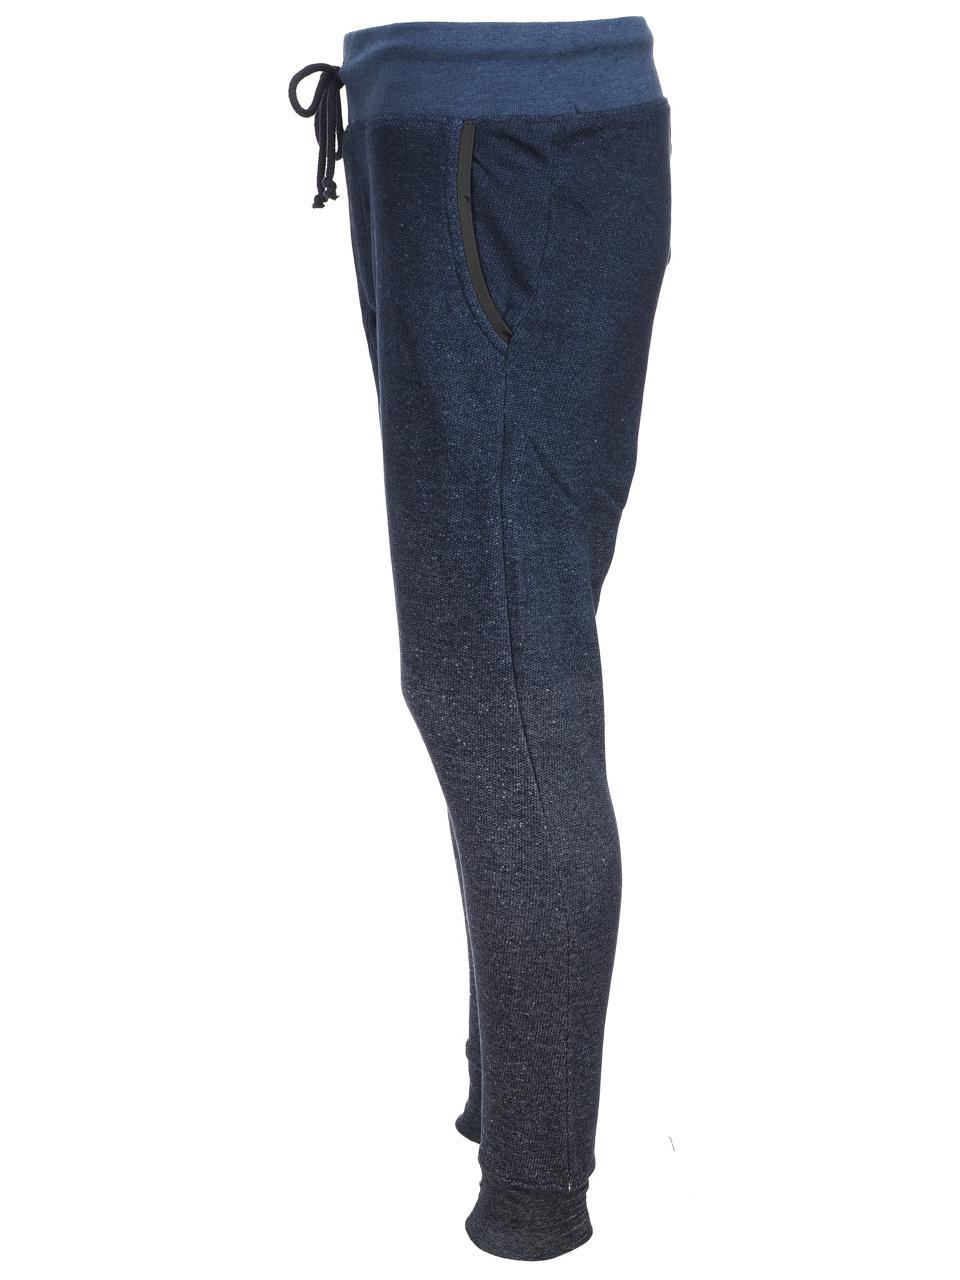 Pantalon-de-survetement-Biaggio-Krodil-navy-pant-jogg-Bleu-57532-Neuf miniature 2